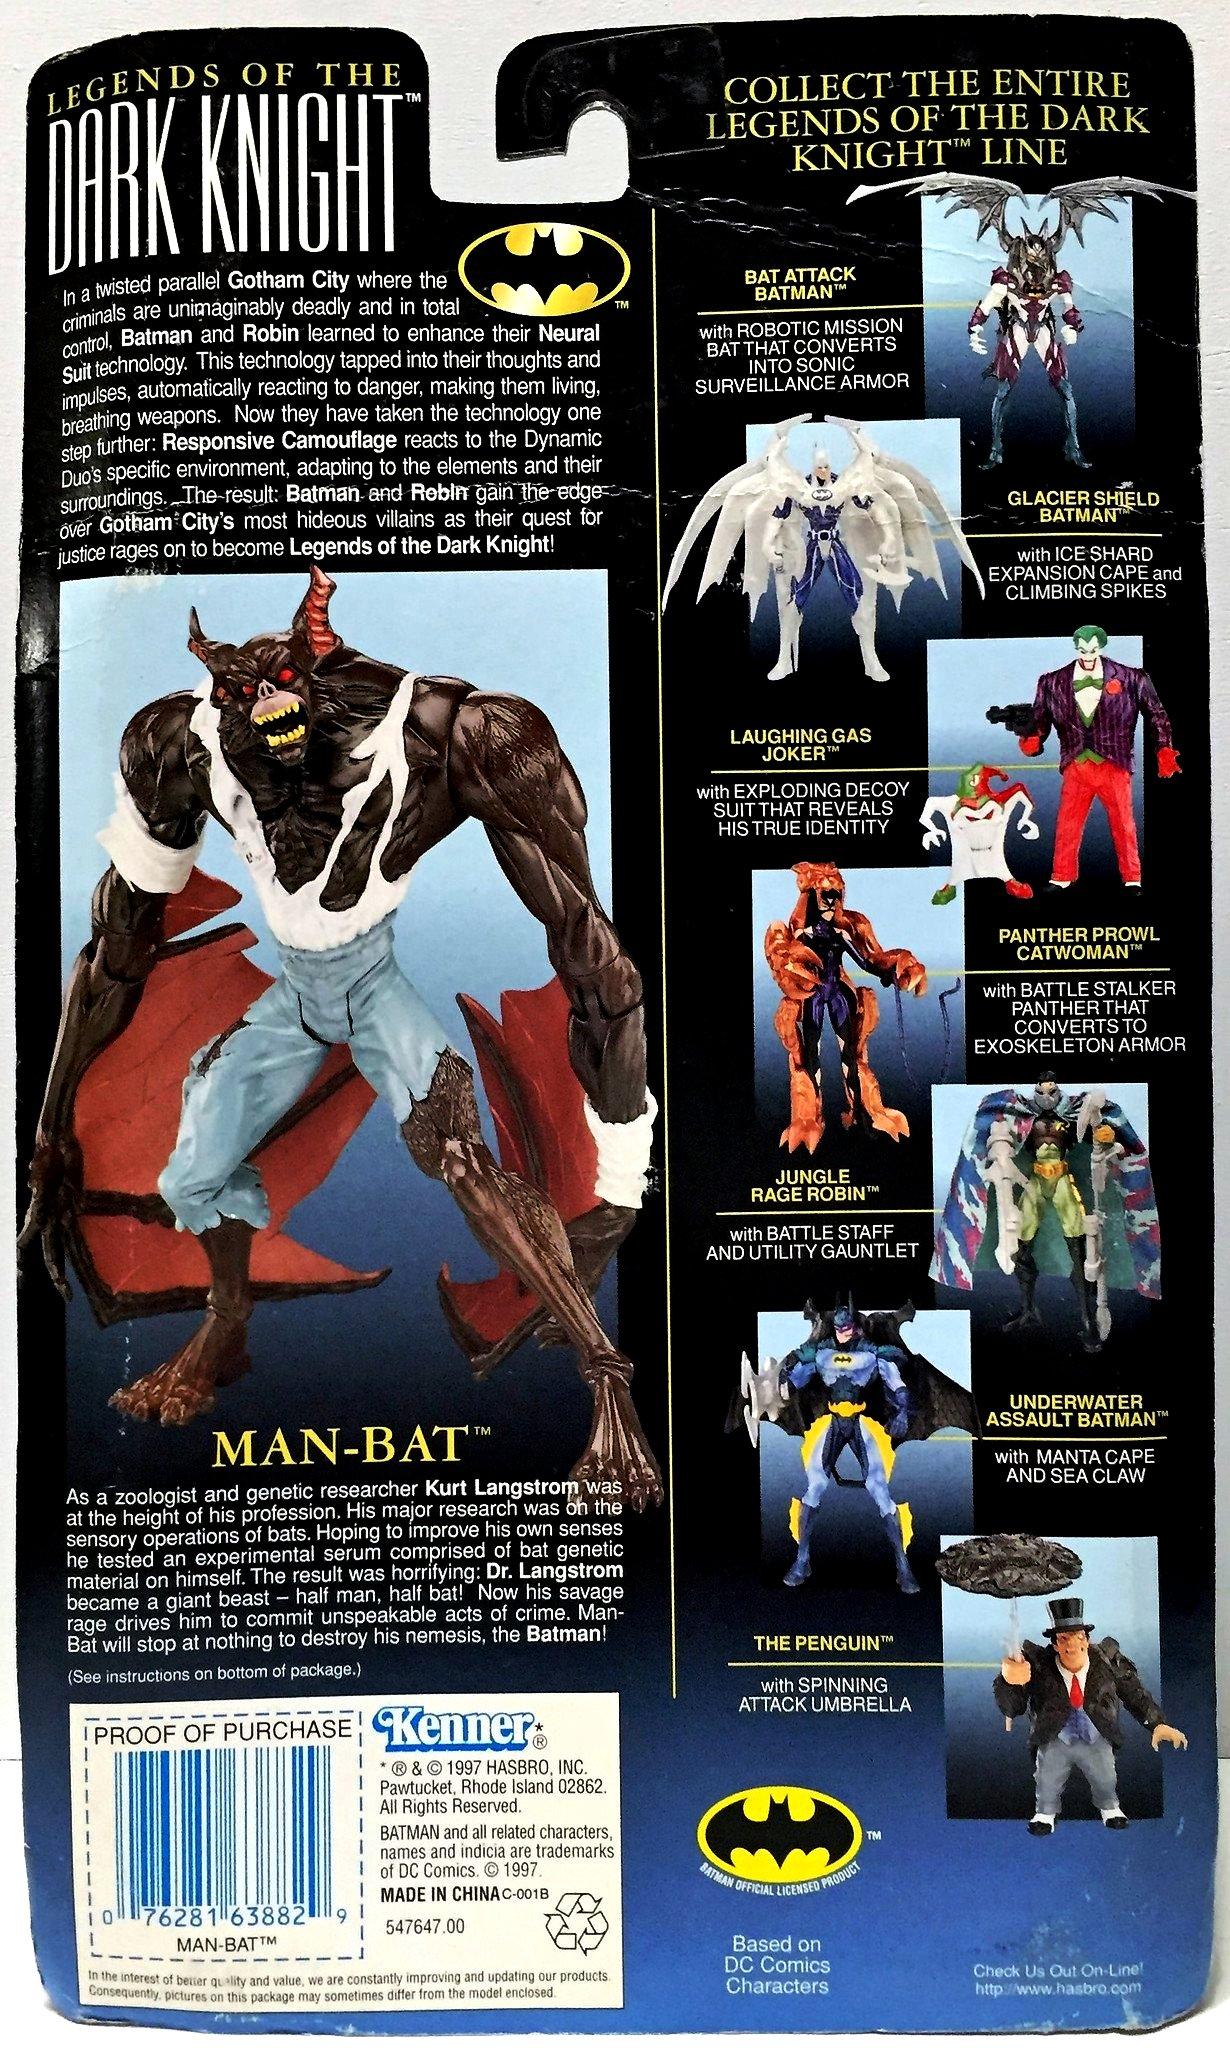 New in Box Legends of the Dark Knight Man-Bat Batman 1997 Kenner Figurine